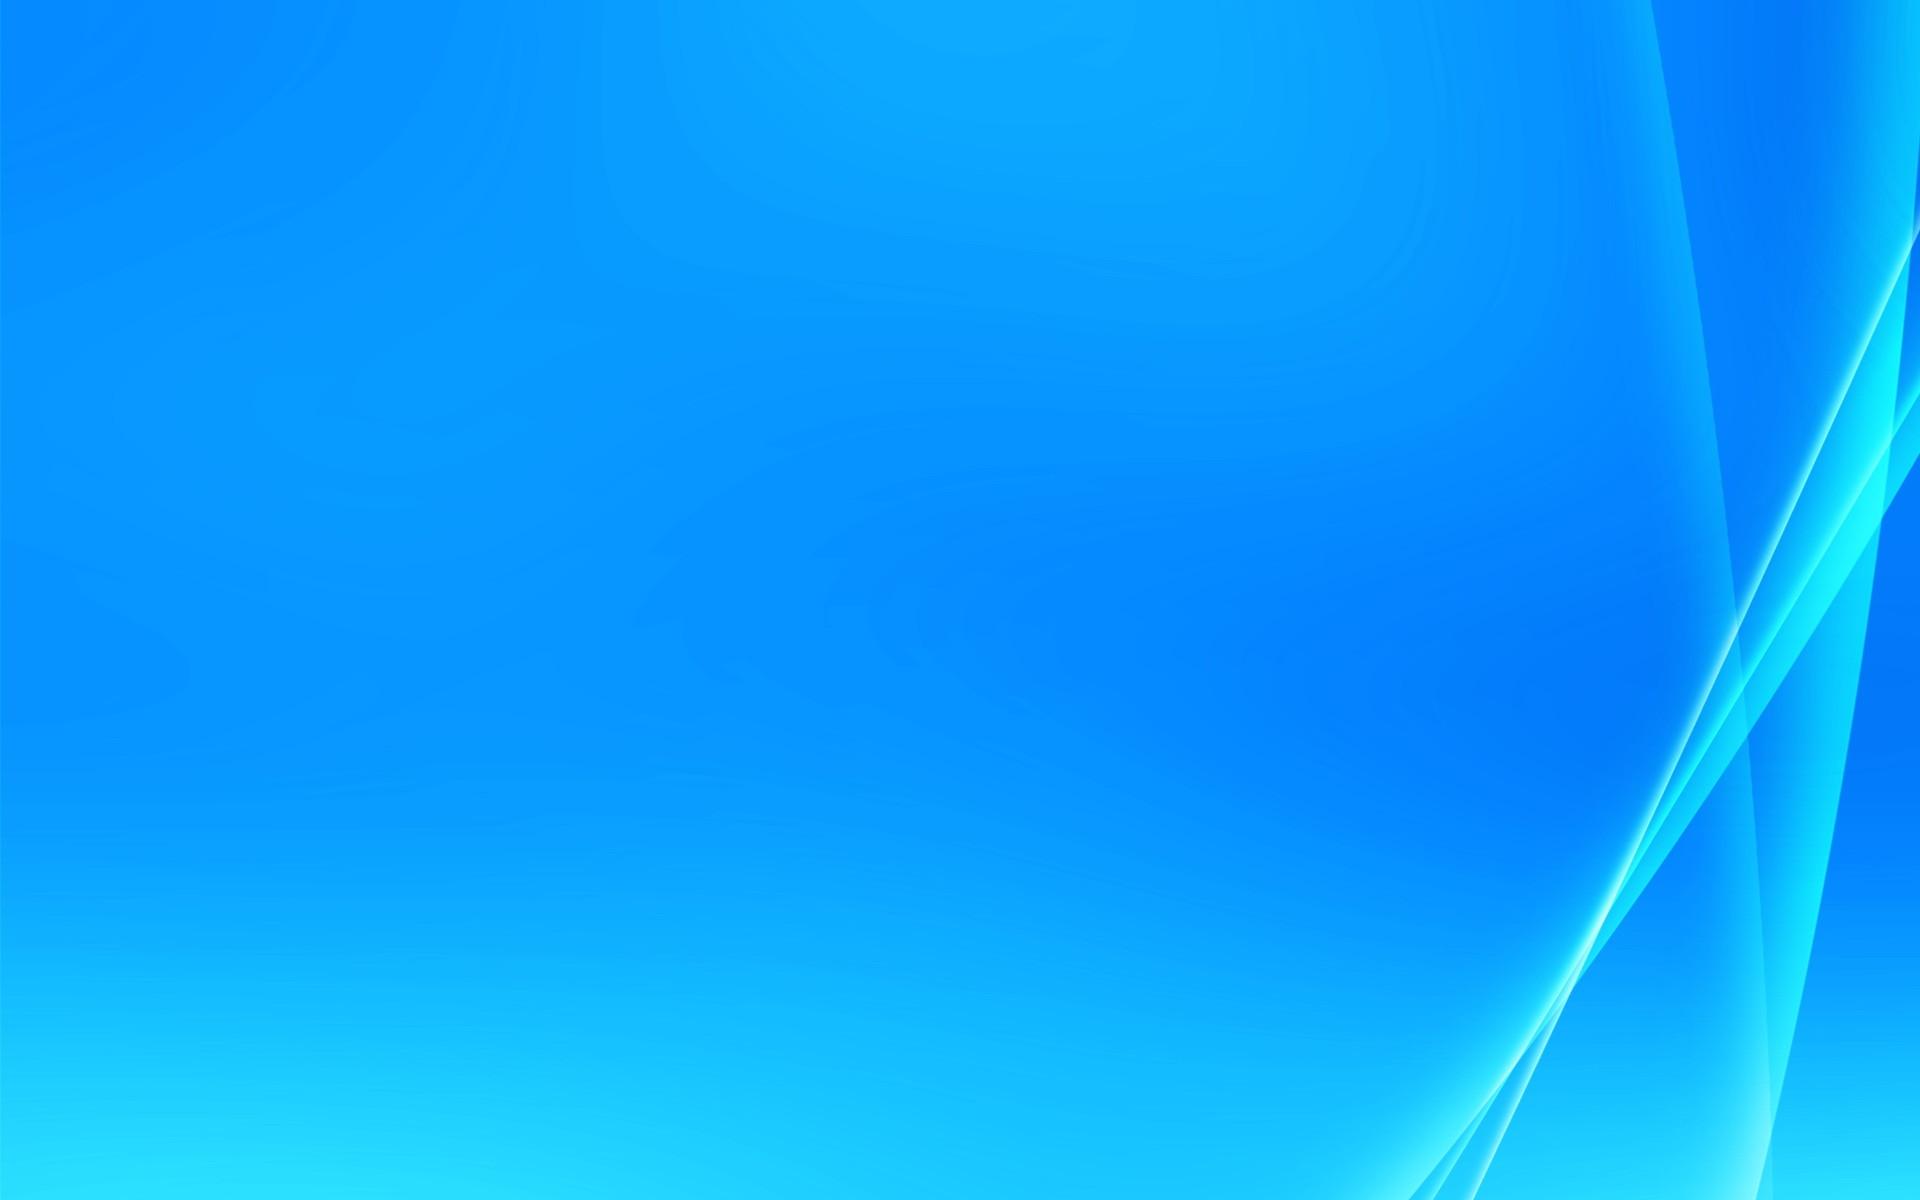 Blue Colour Wallpapers Blue Colour Hd Wallpaper For